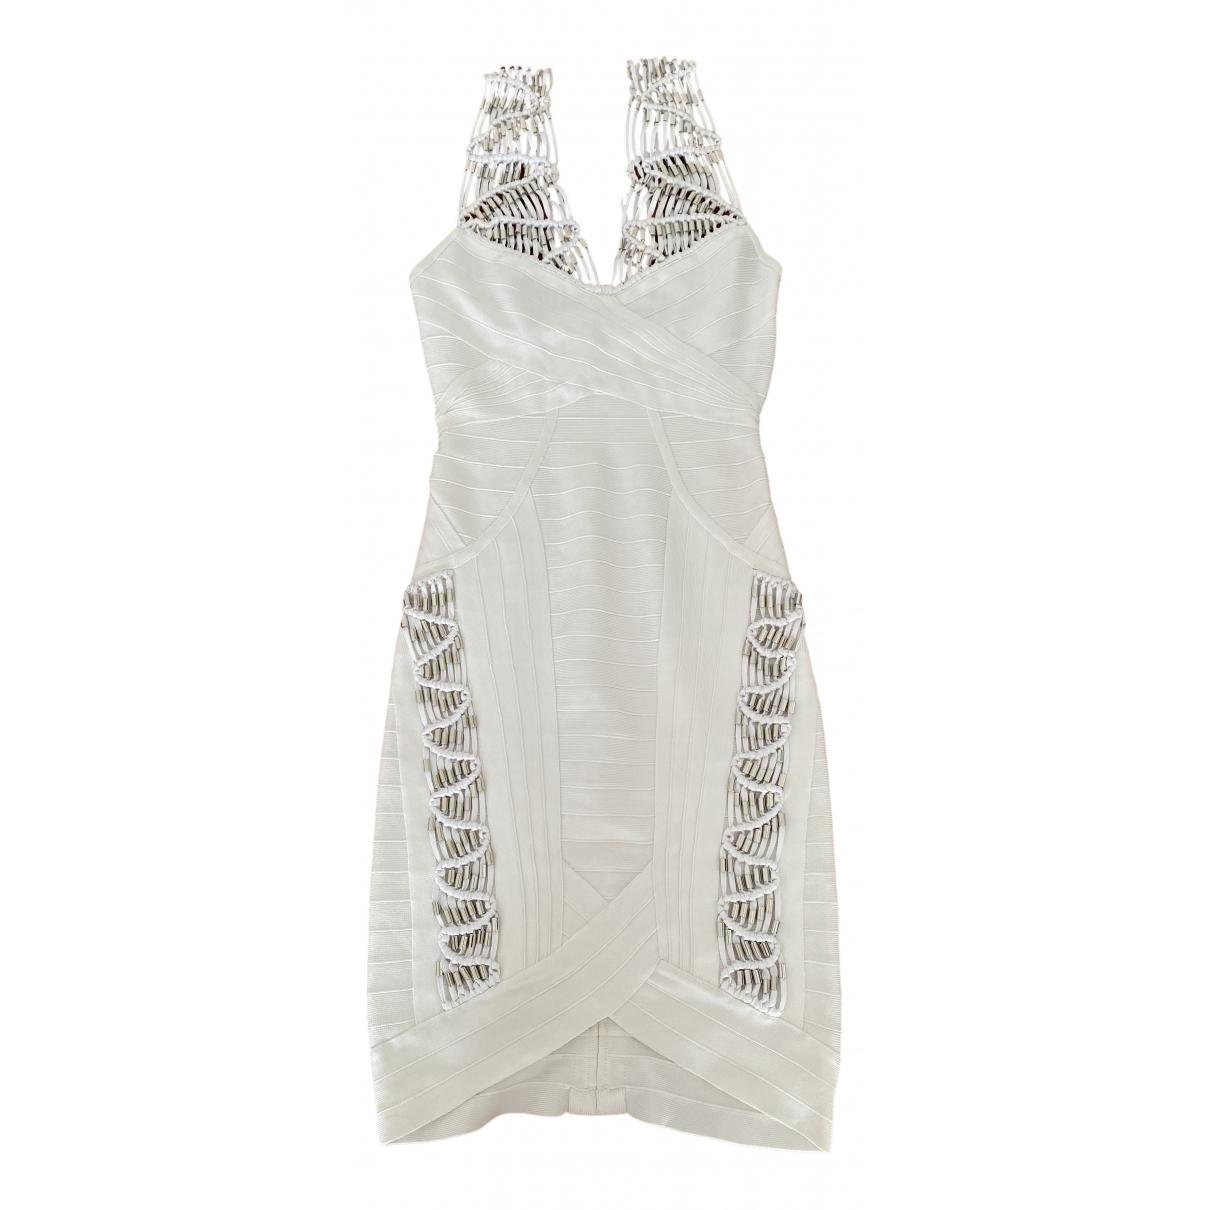 Herve Leger - Robe   pour femme en coton - elasthane - blanc